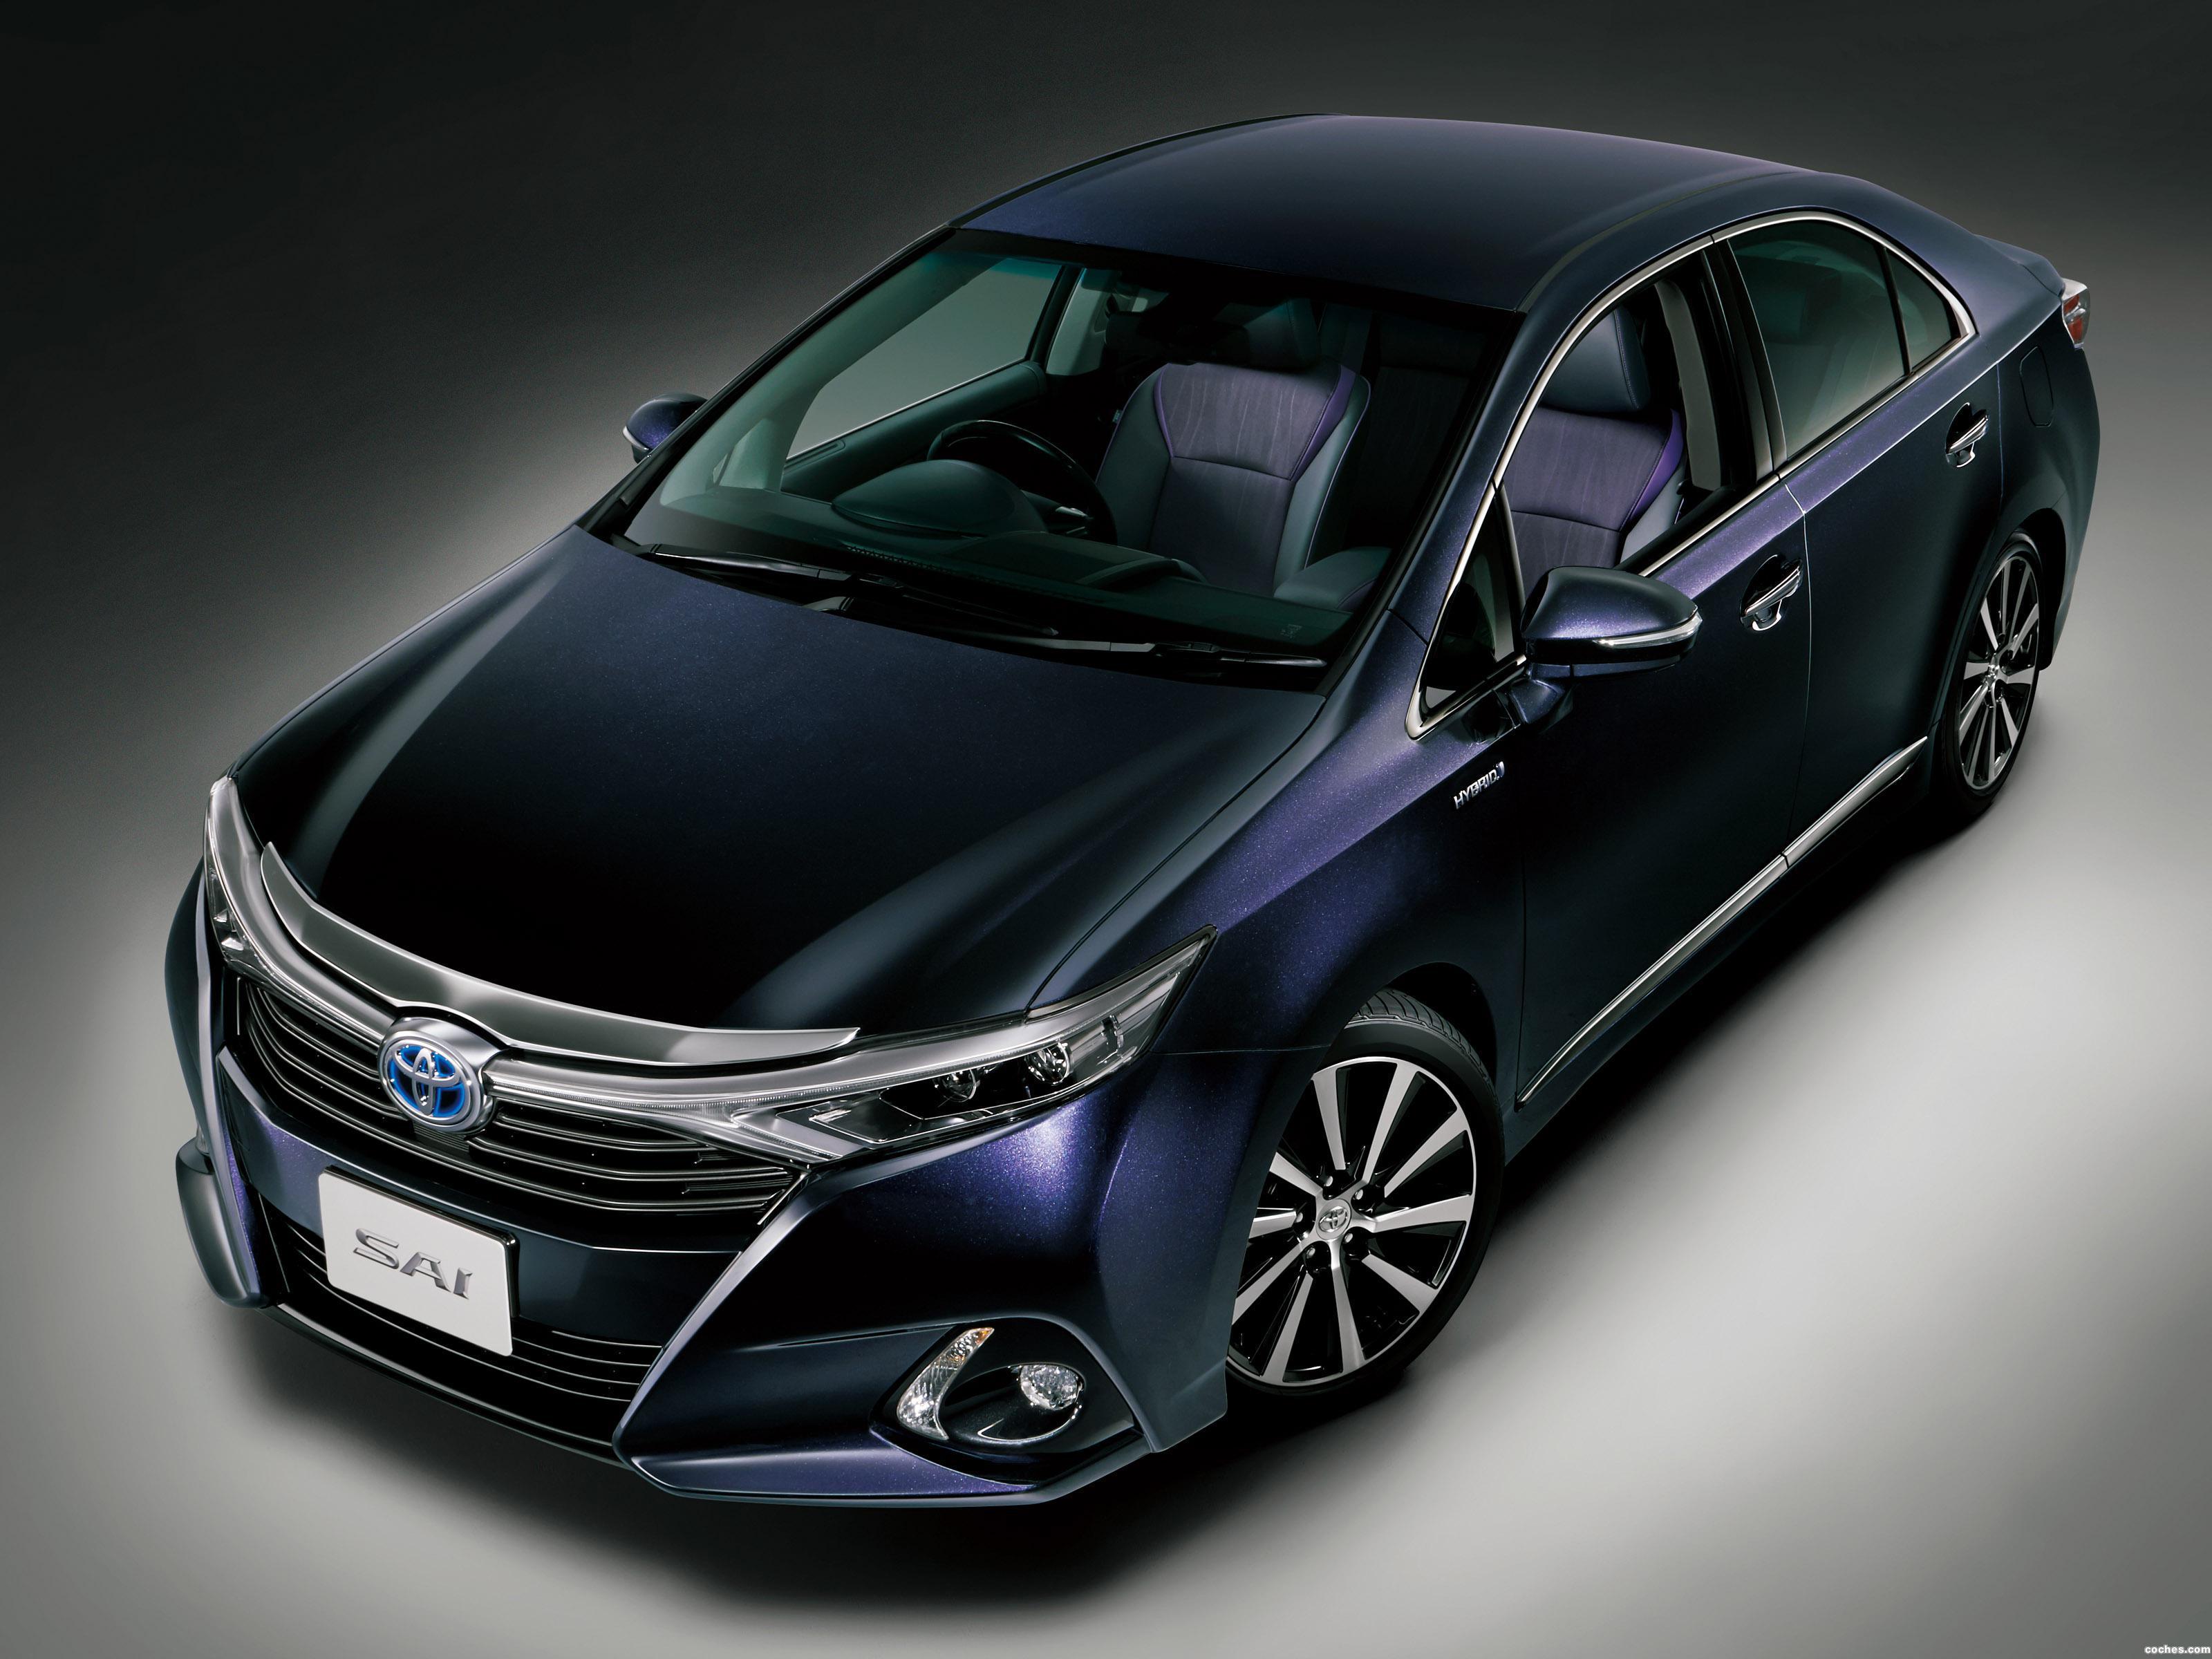 Foto 0 de Toyota Sai G Viola 2015